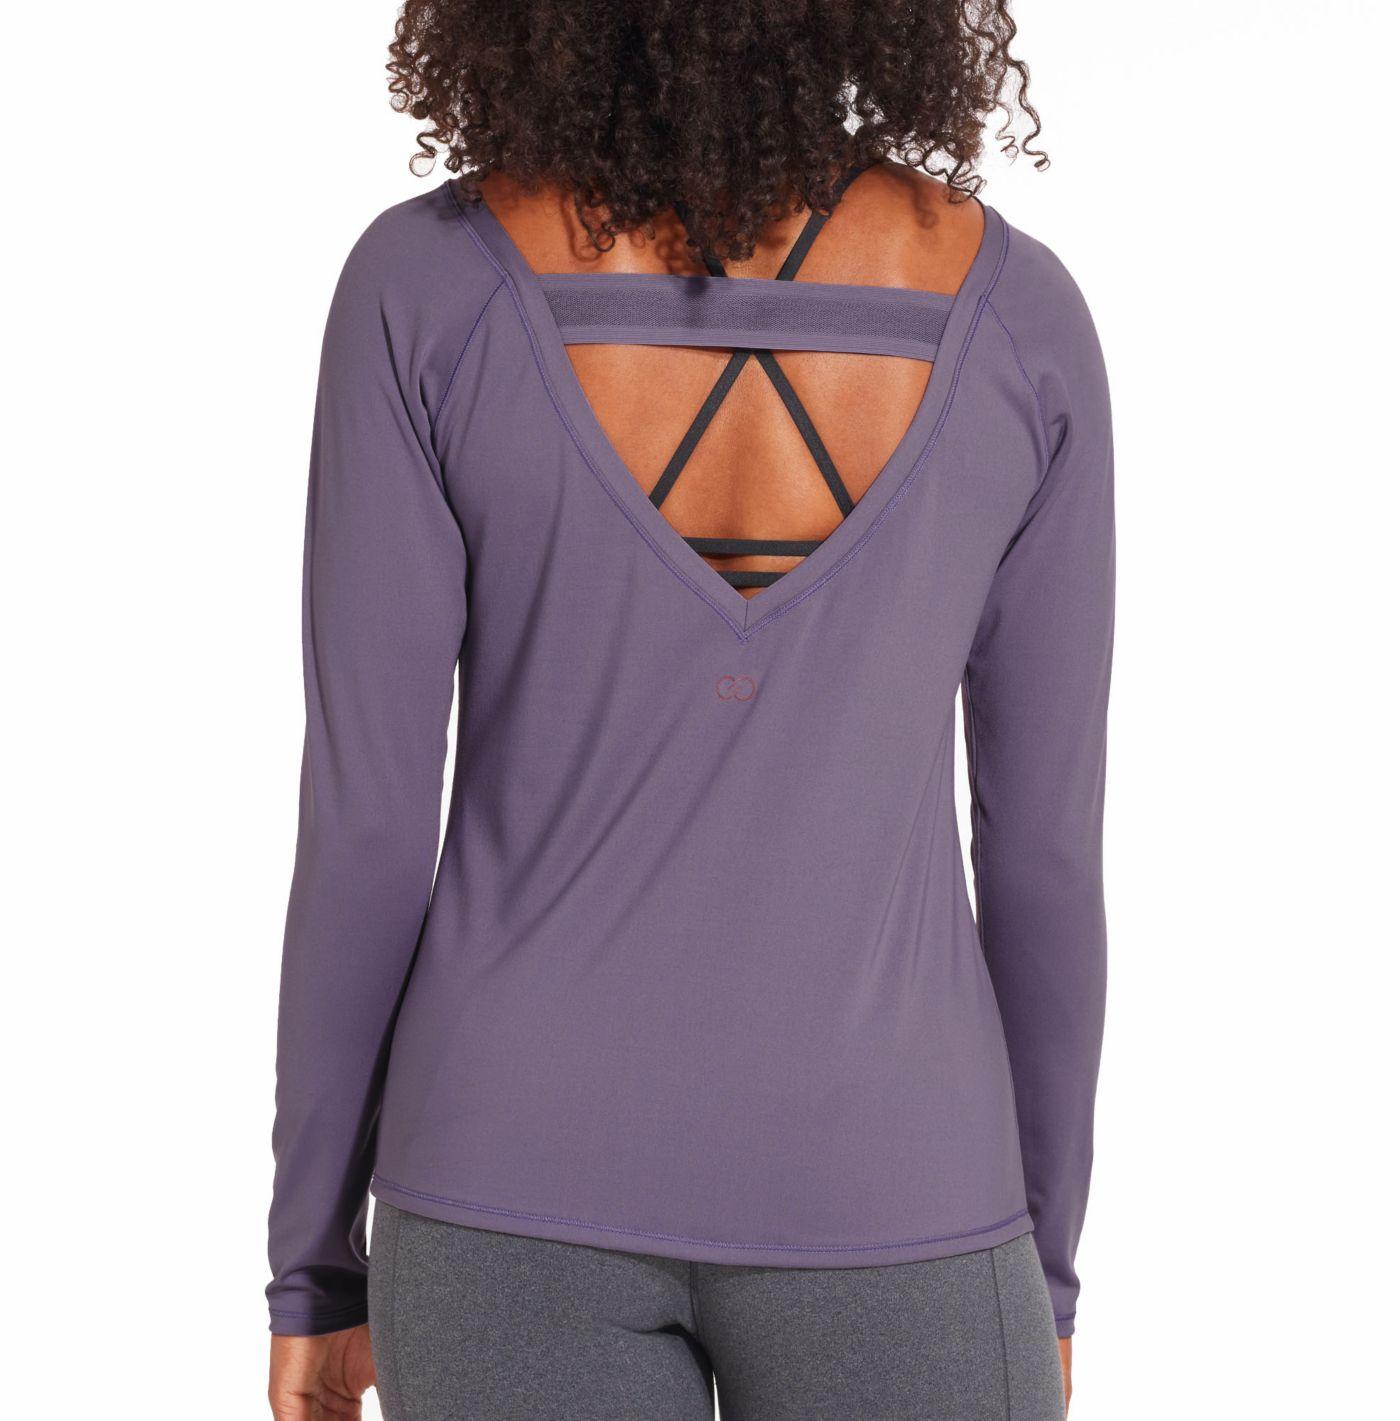 CALIA by Carrie Underwood Women's Elastic Back Long Sleeve Shirt